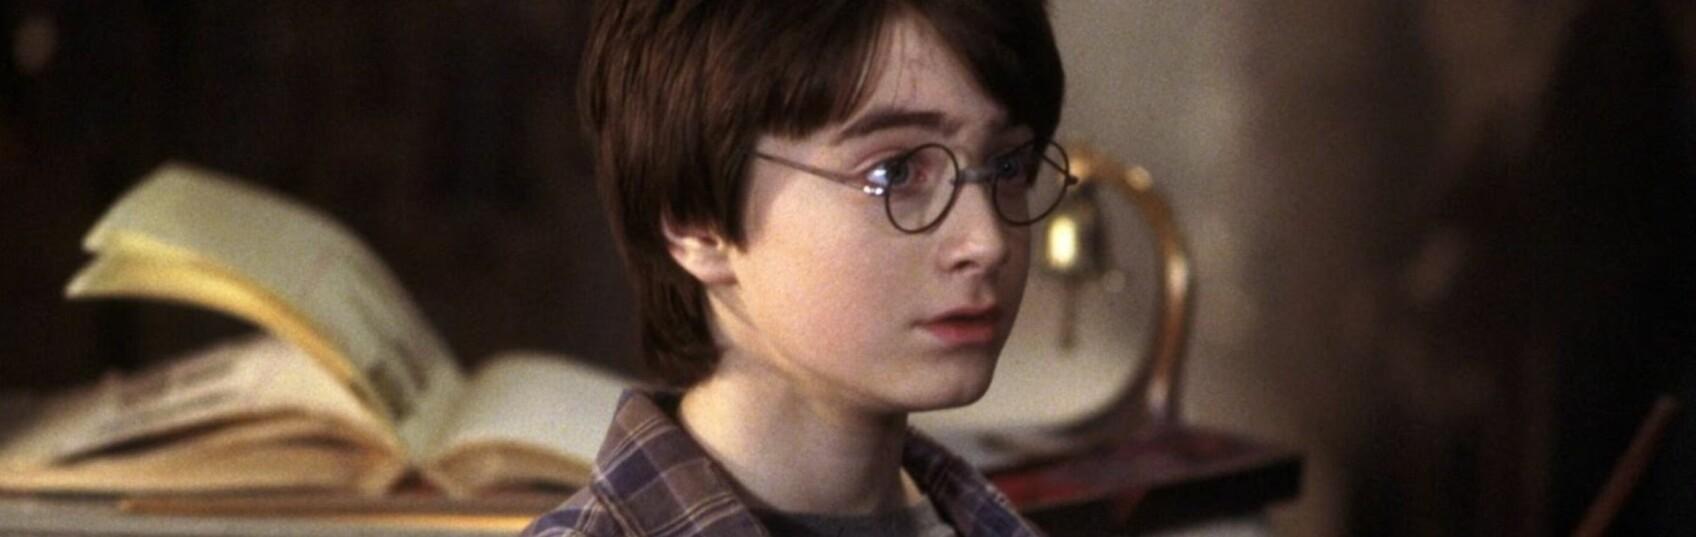 HARRY POTTER: Daniel Radcliffe har vokst opp på skjermen, og da han var på audition for rollen var han bare sååå søt! FOTO: Scanpix